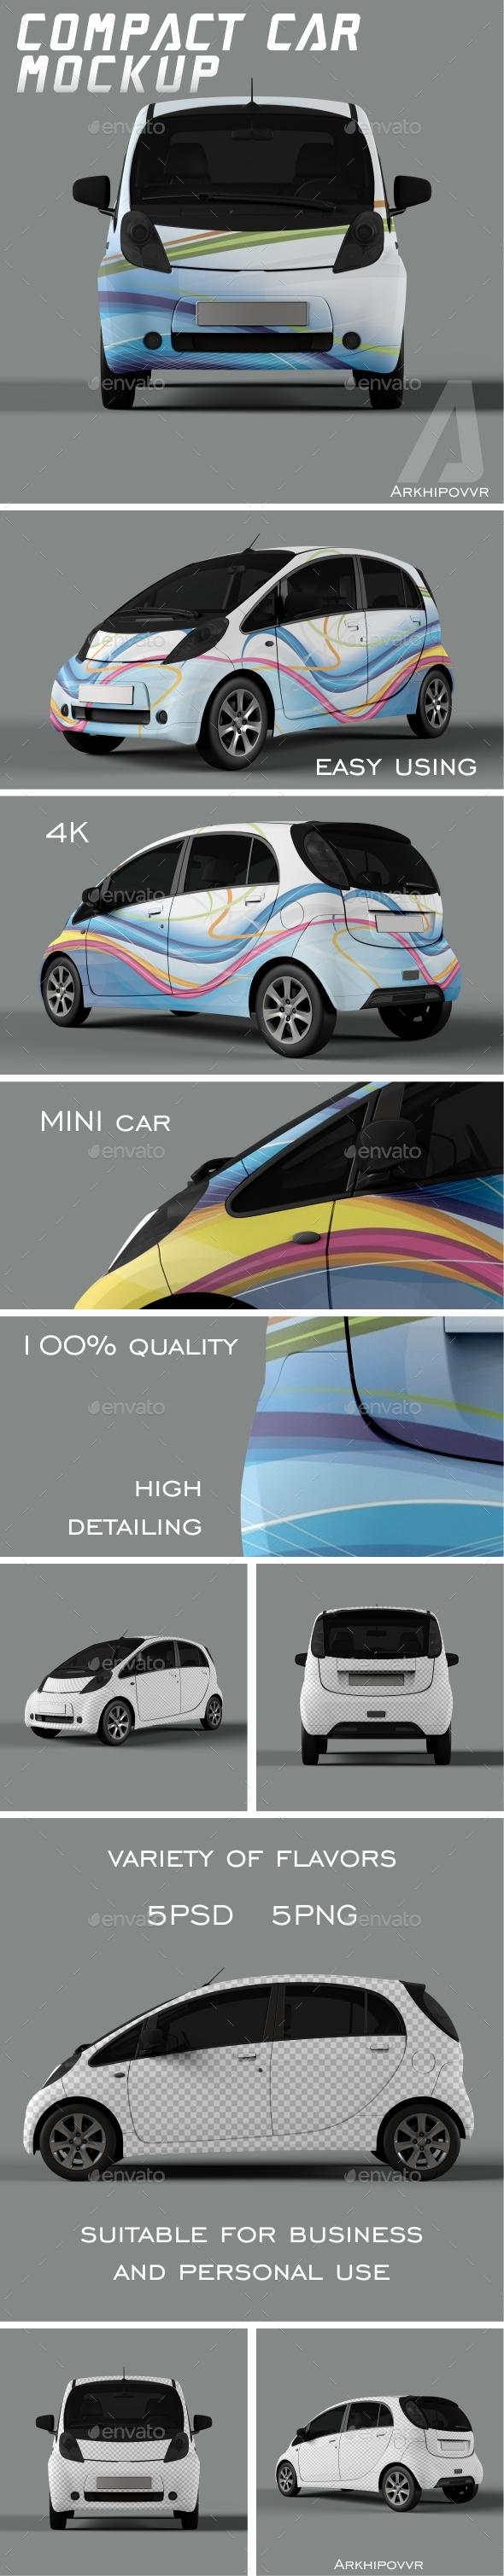 Compact Car Mockup - Product Mock-Ups Graphics